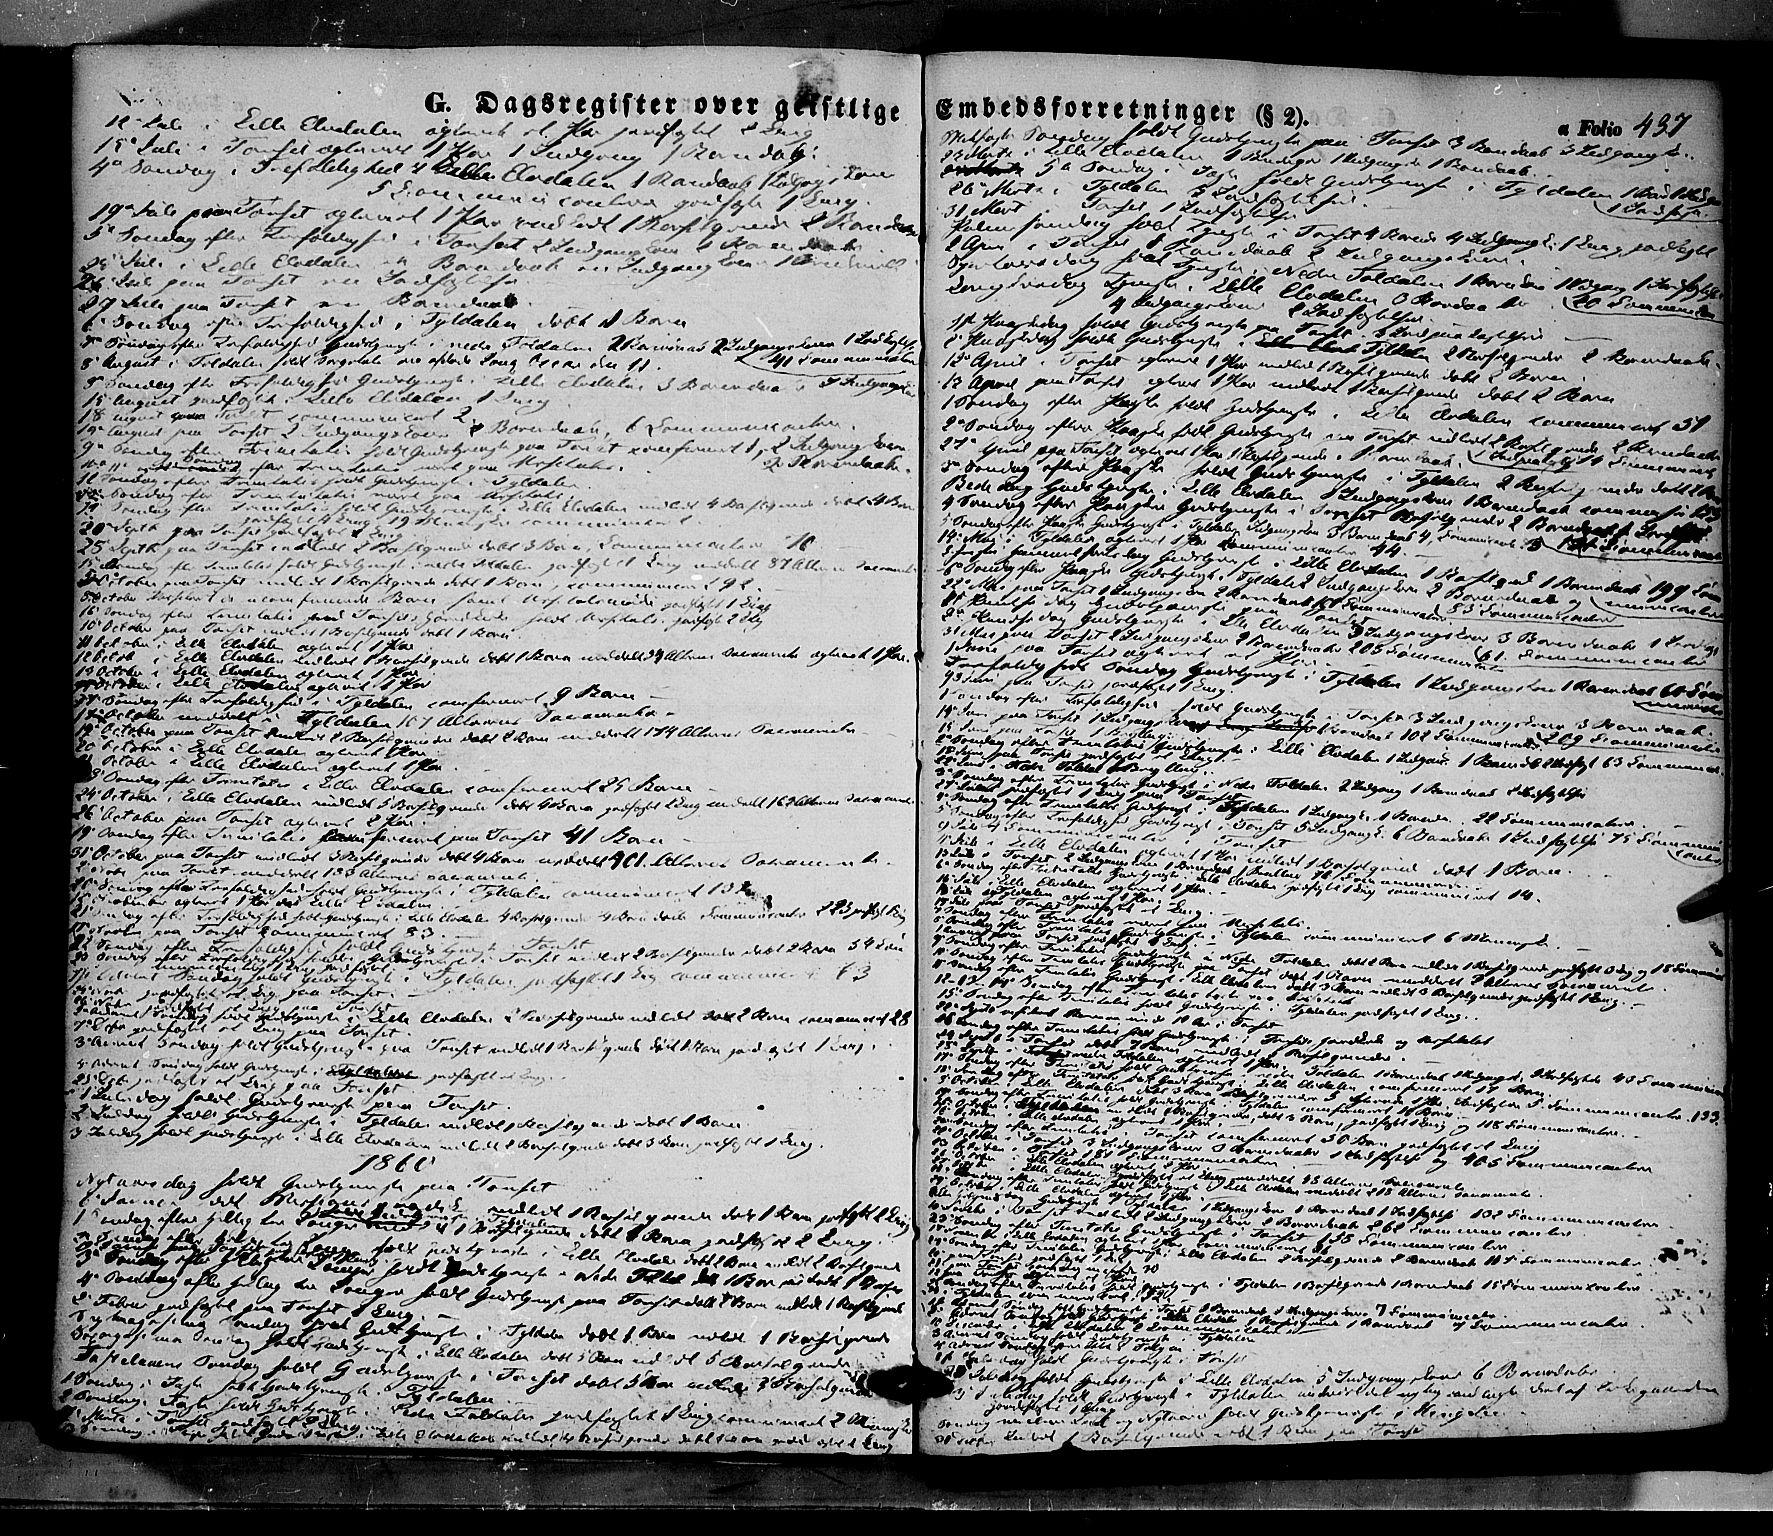 SAH, Tynset prestekontor, Ministerialbok nr. 20, 1848-1862, s. 437